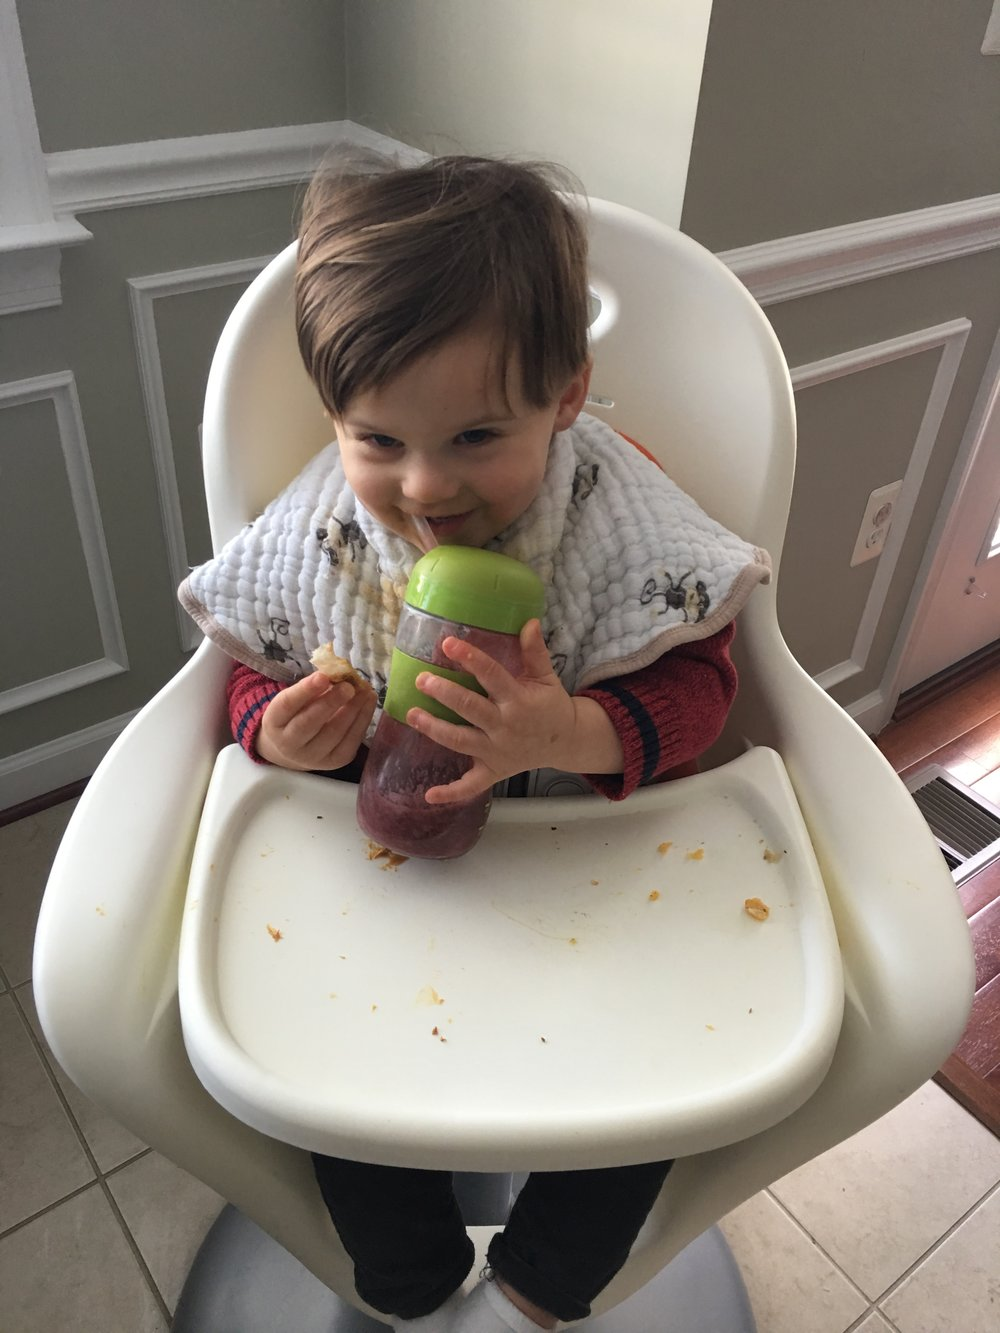 Brayden is enjoying his smoothie today.